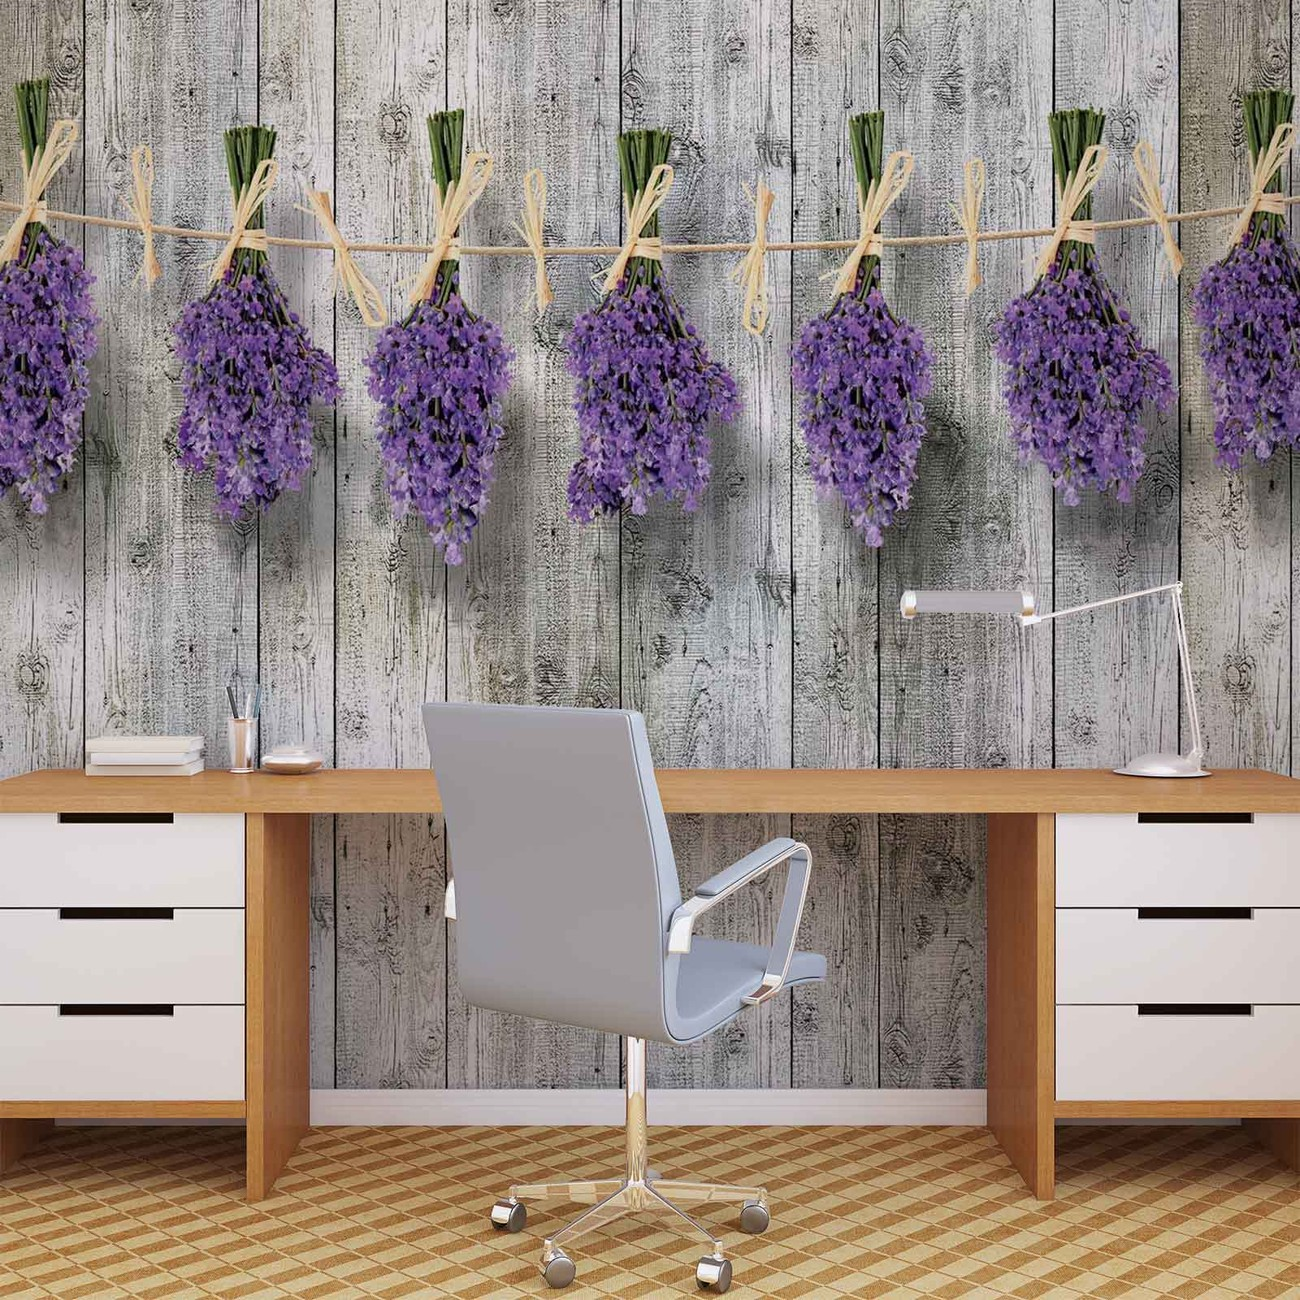 Carta da parati muro in legno fiori lavanda for Carta da parati muro